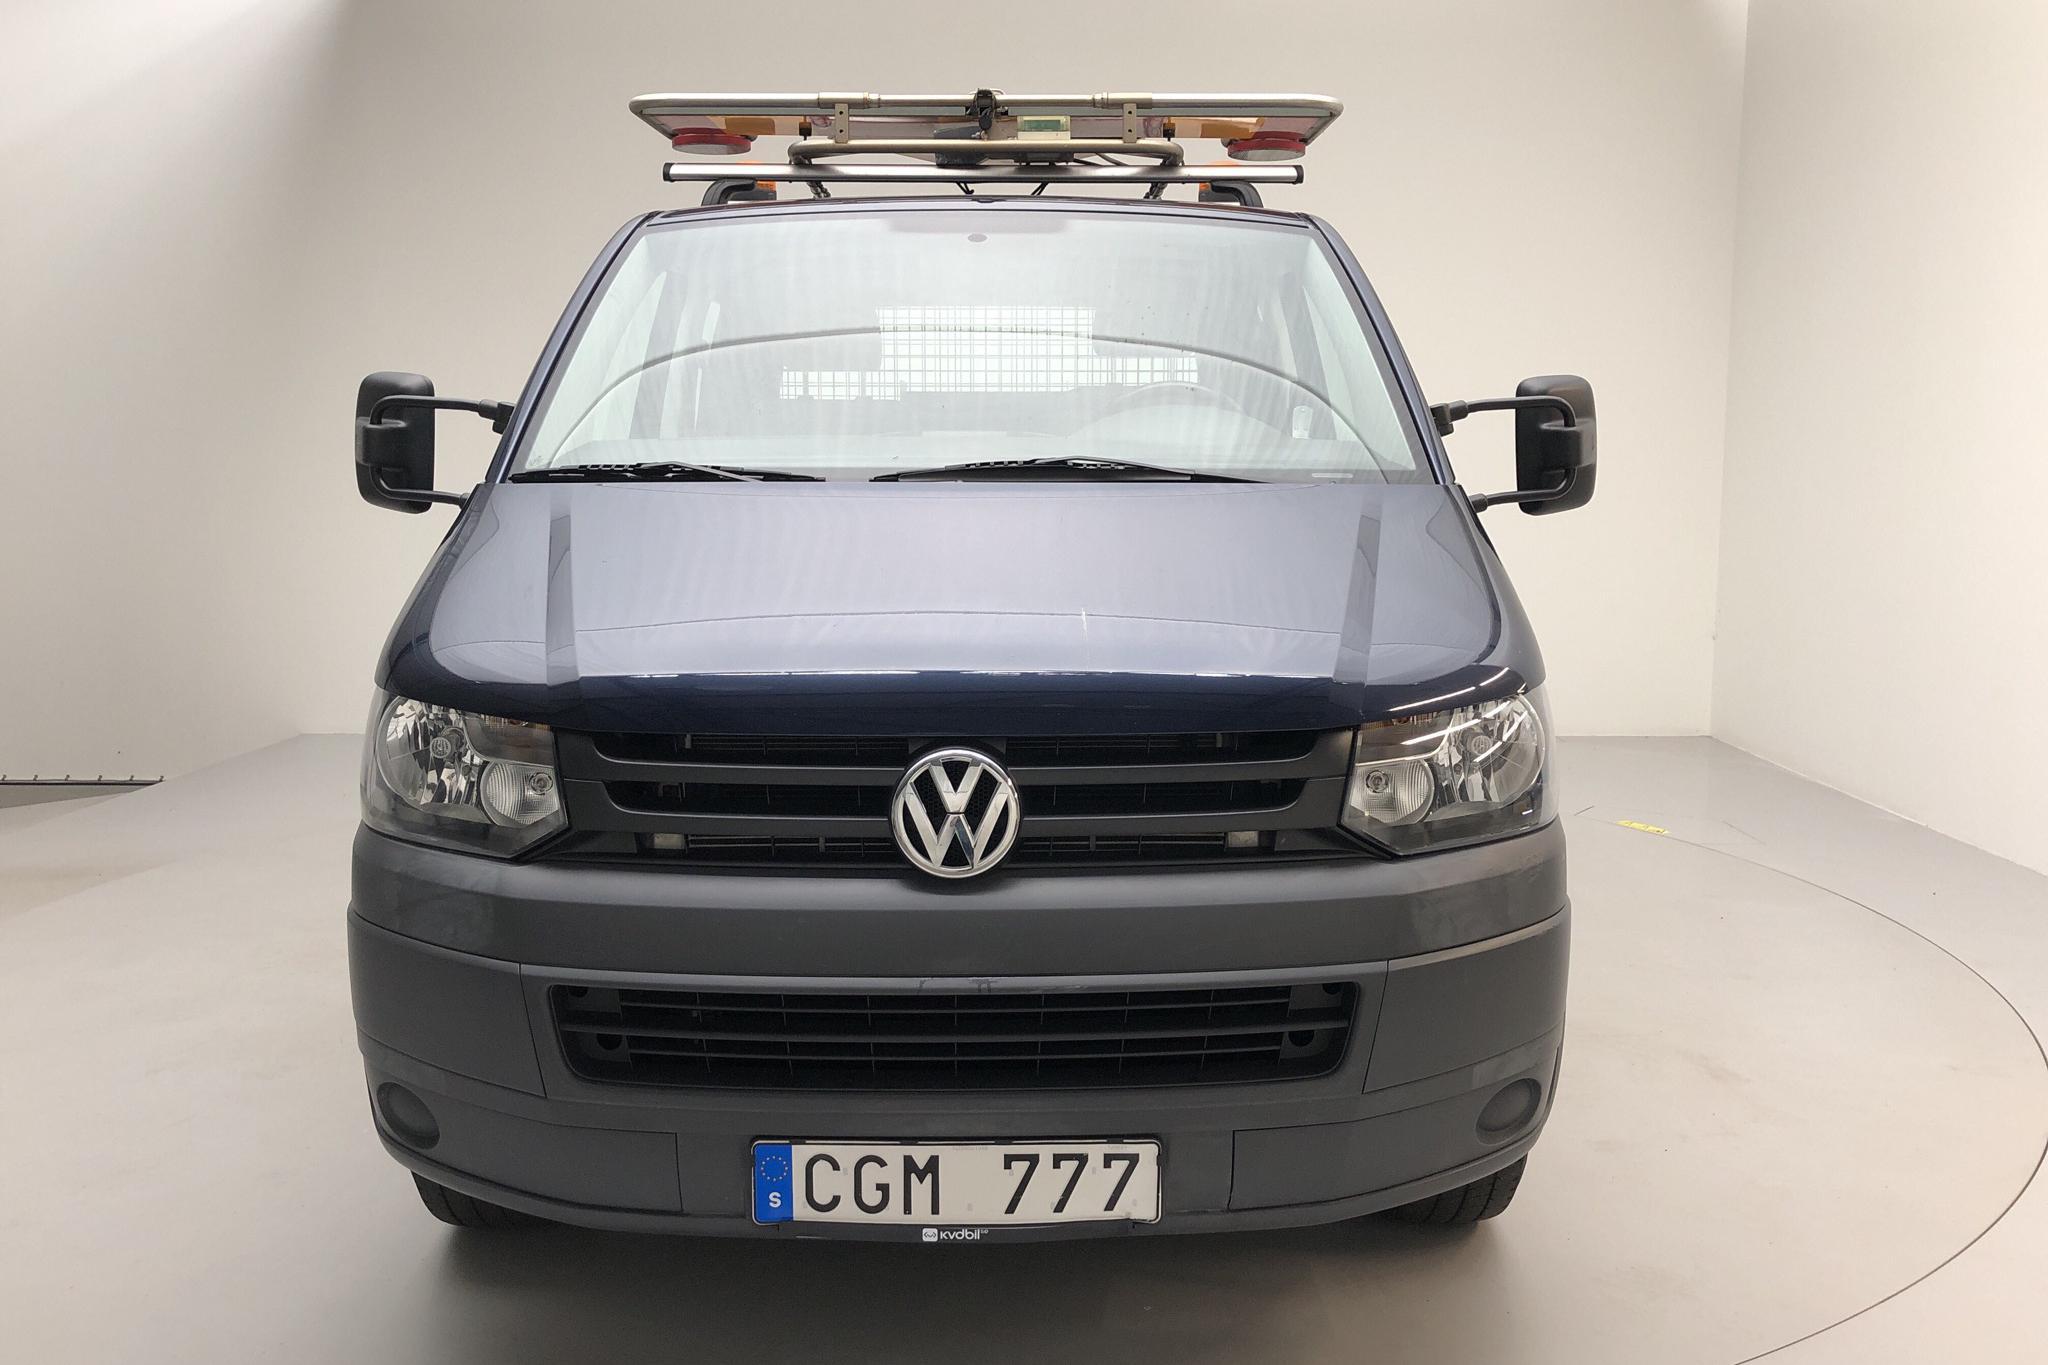 VW Transporter T5 2.0 TDI Pickup (140hk) - 7 098 mil - Automat - Dark Blue - 2013